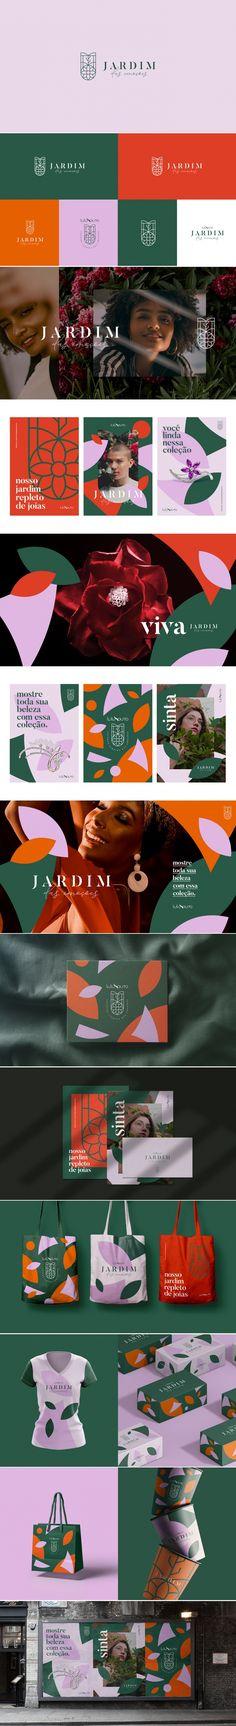 Jardim das Emoções branding by John Dias Brand Identity Design, Corporate Design, Branding Design, Branding Agency, Logo Branding, Logo Inspiration, Web Design, Graphic Design, Brand Packaging